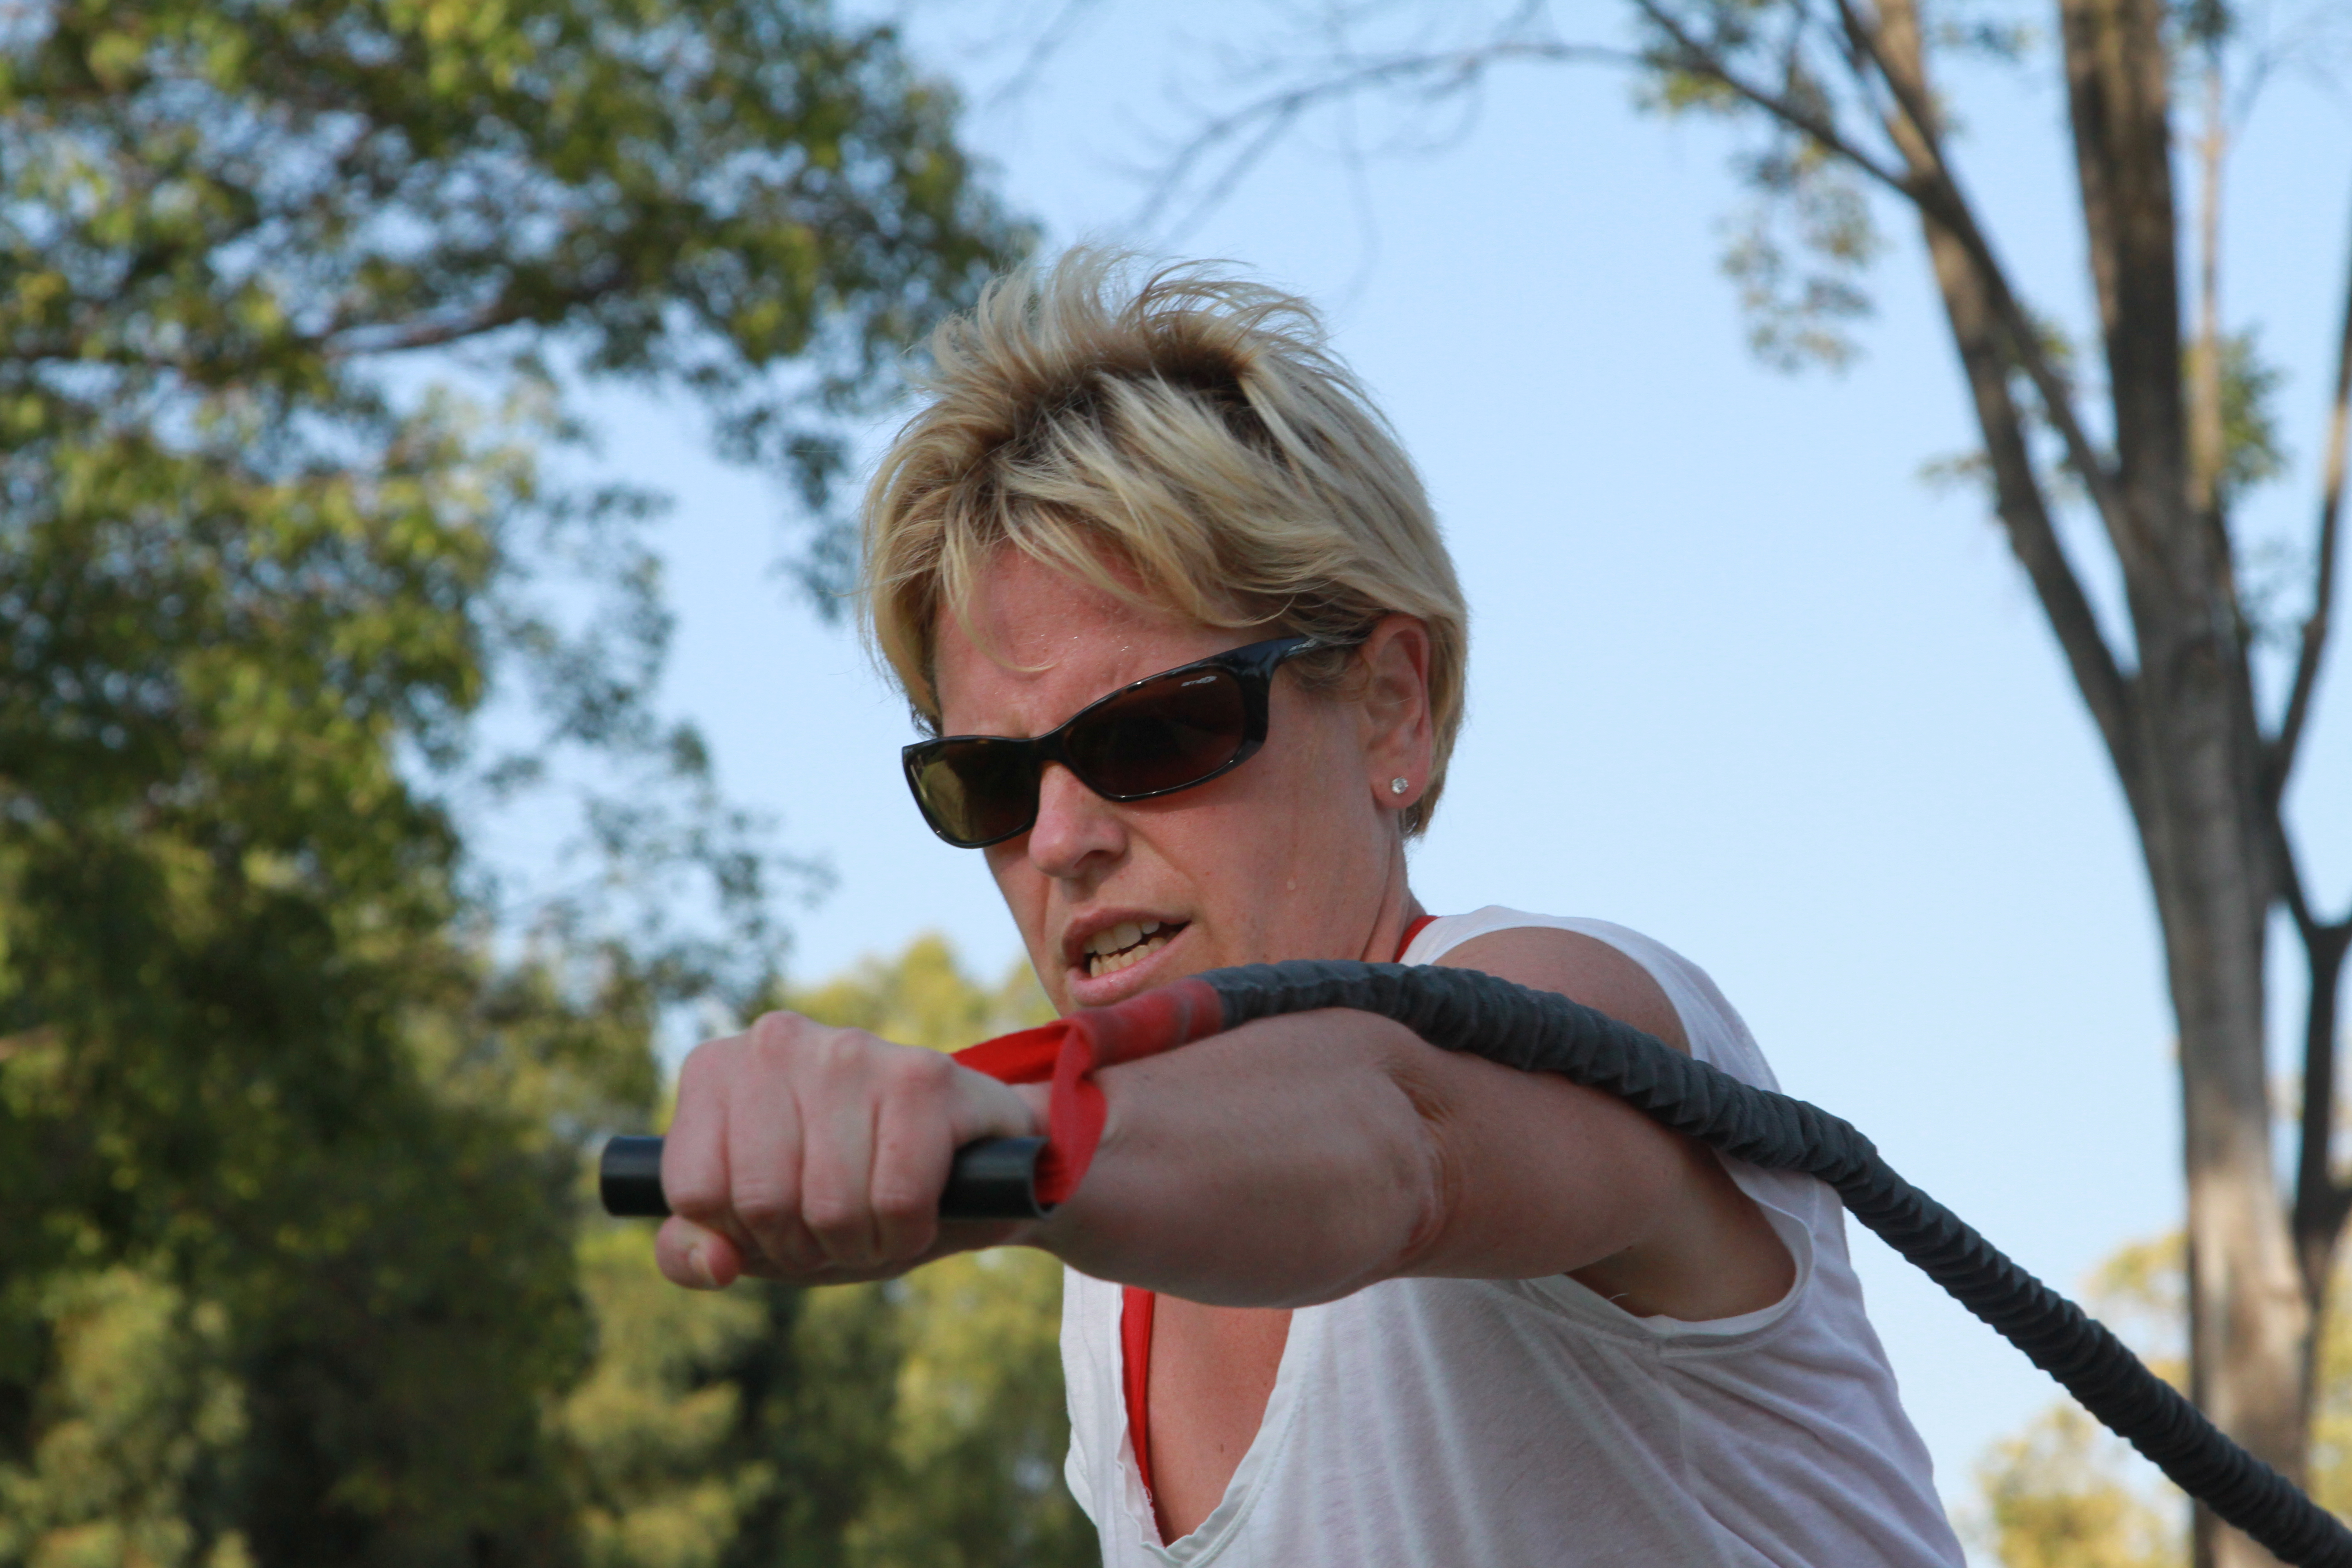 Shauna: Even in Tough times I train